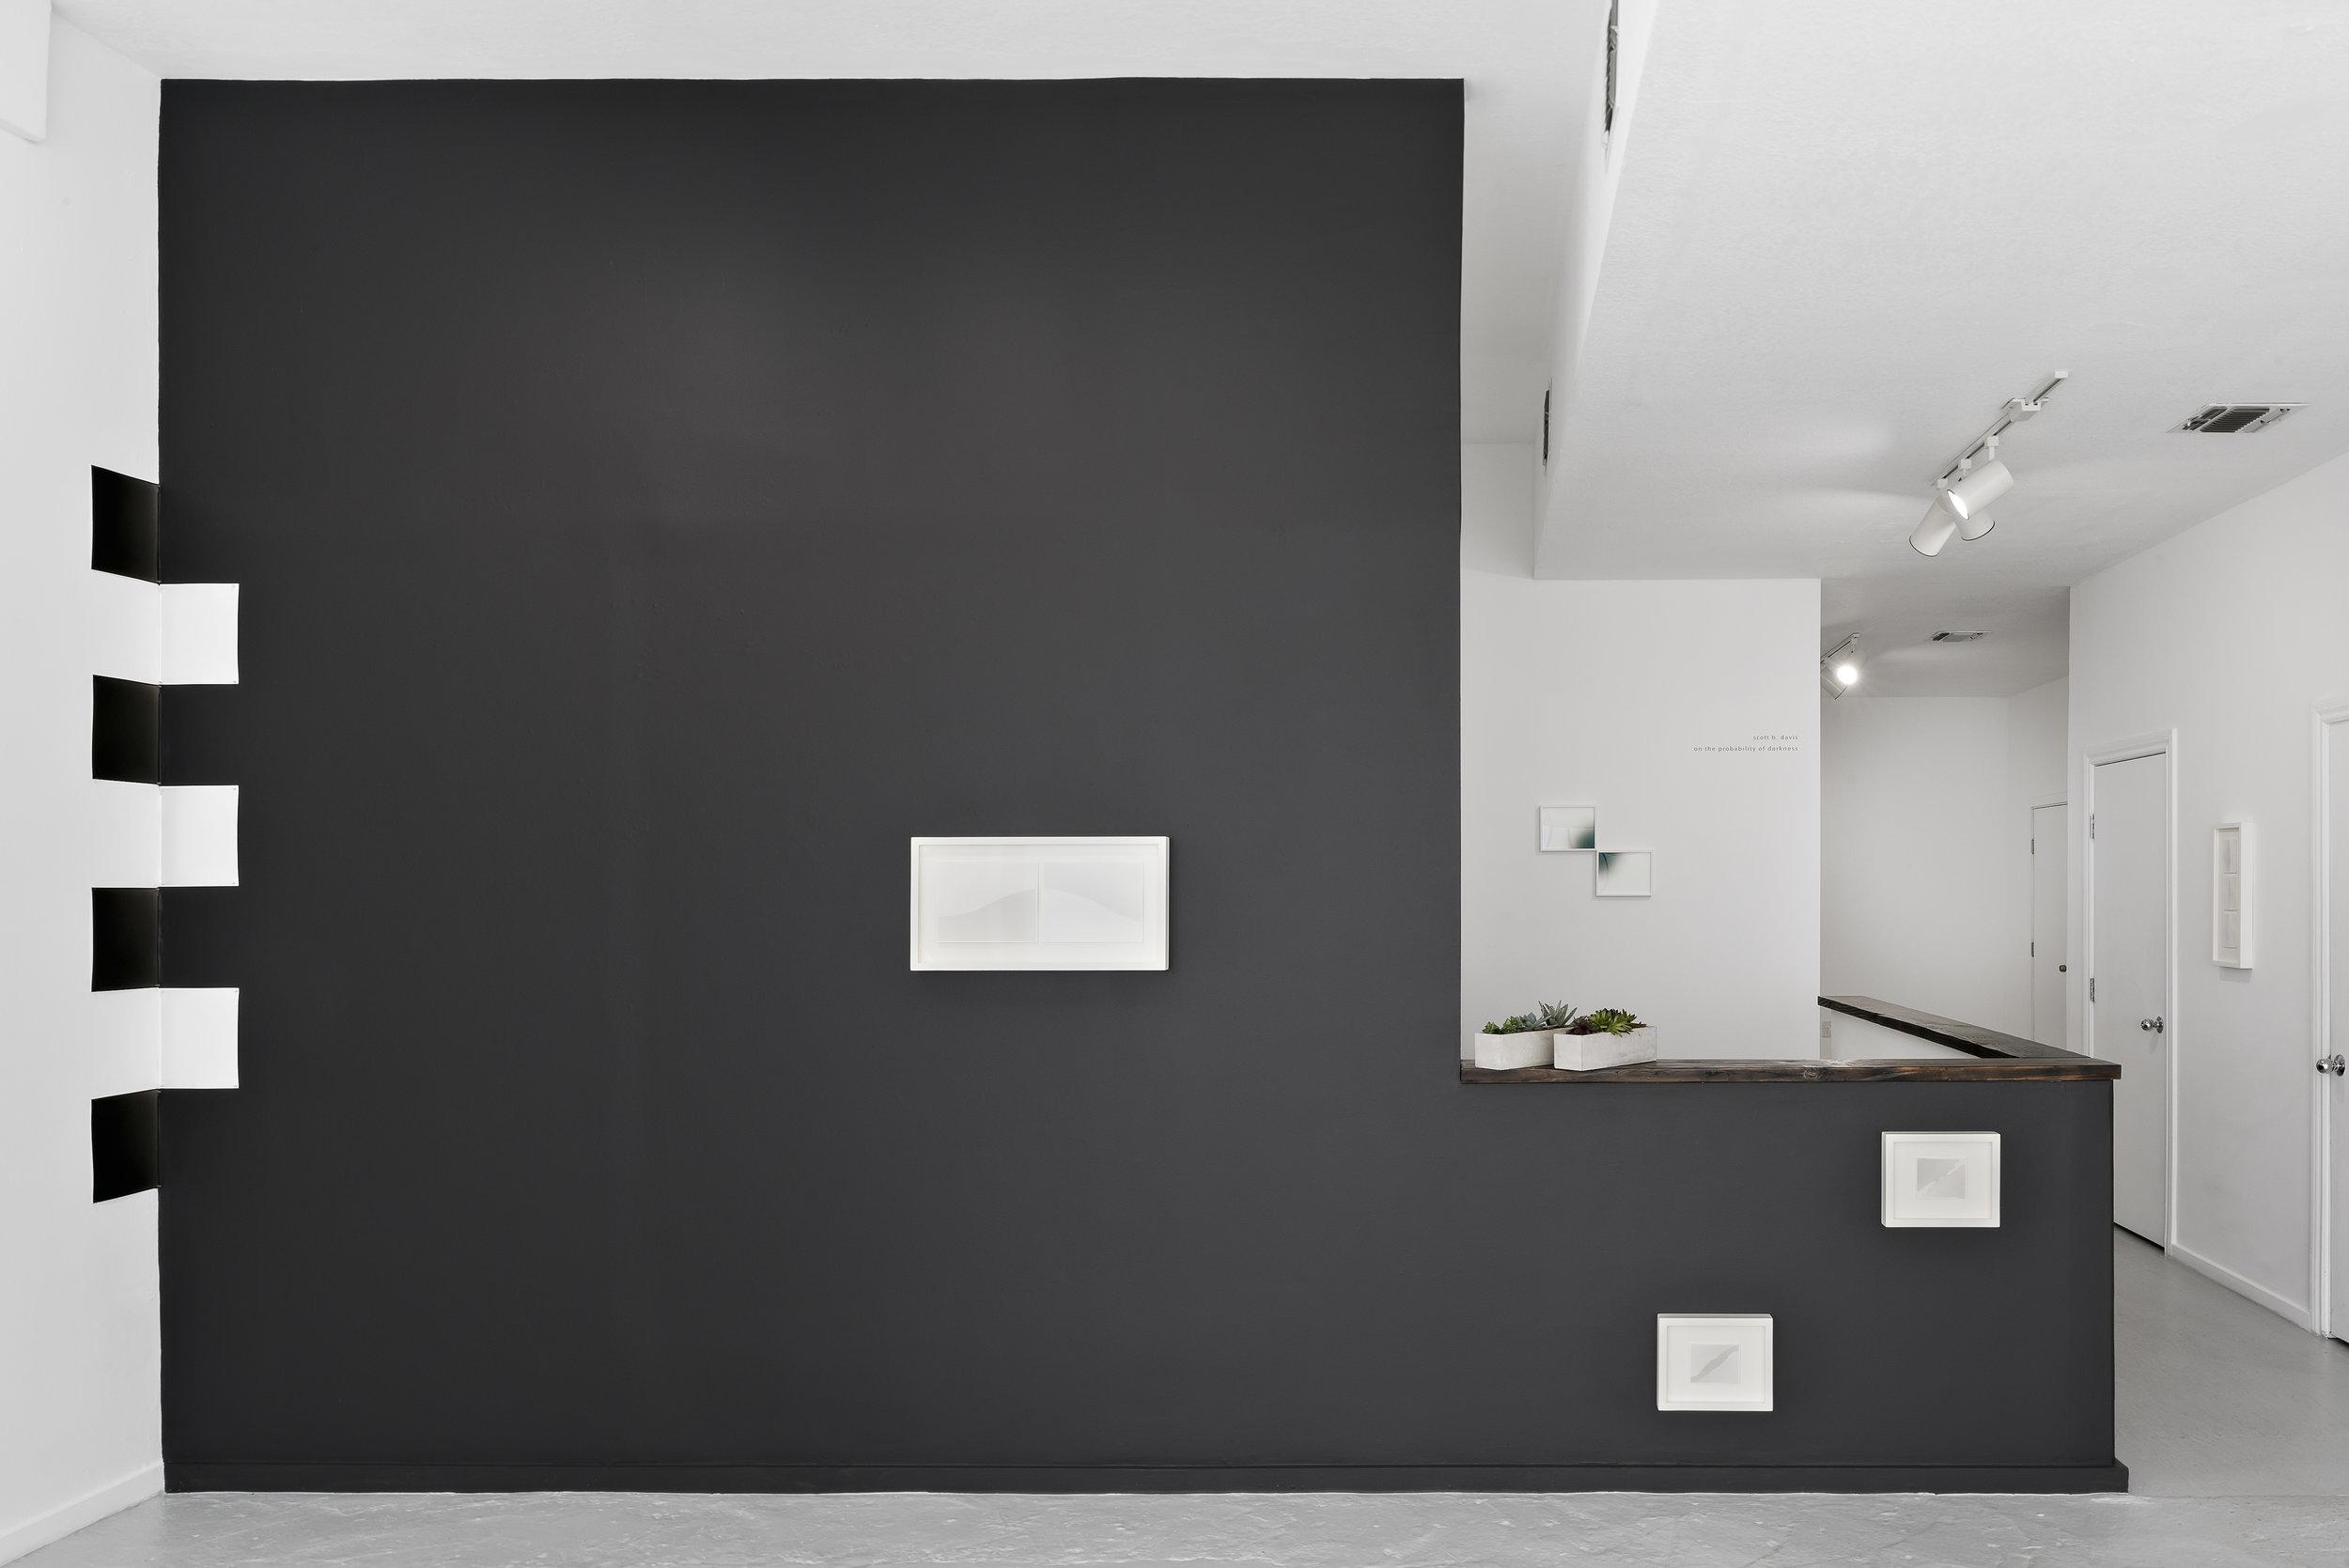 2019_04 - EUQINOM - Davis install-02.jpg